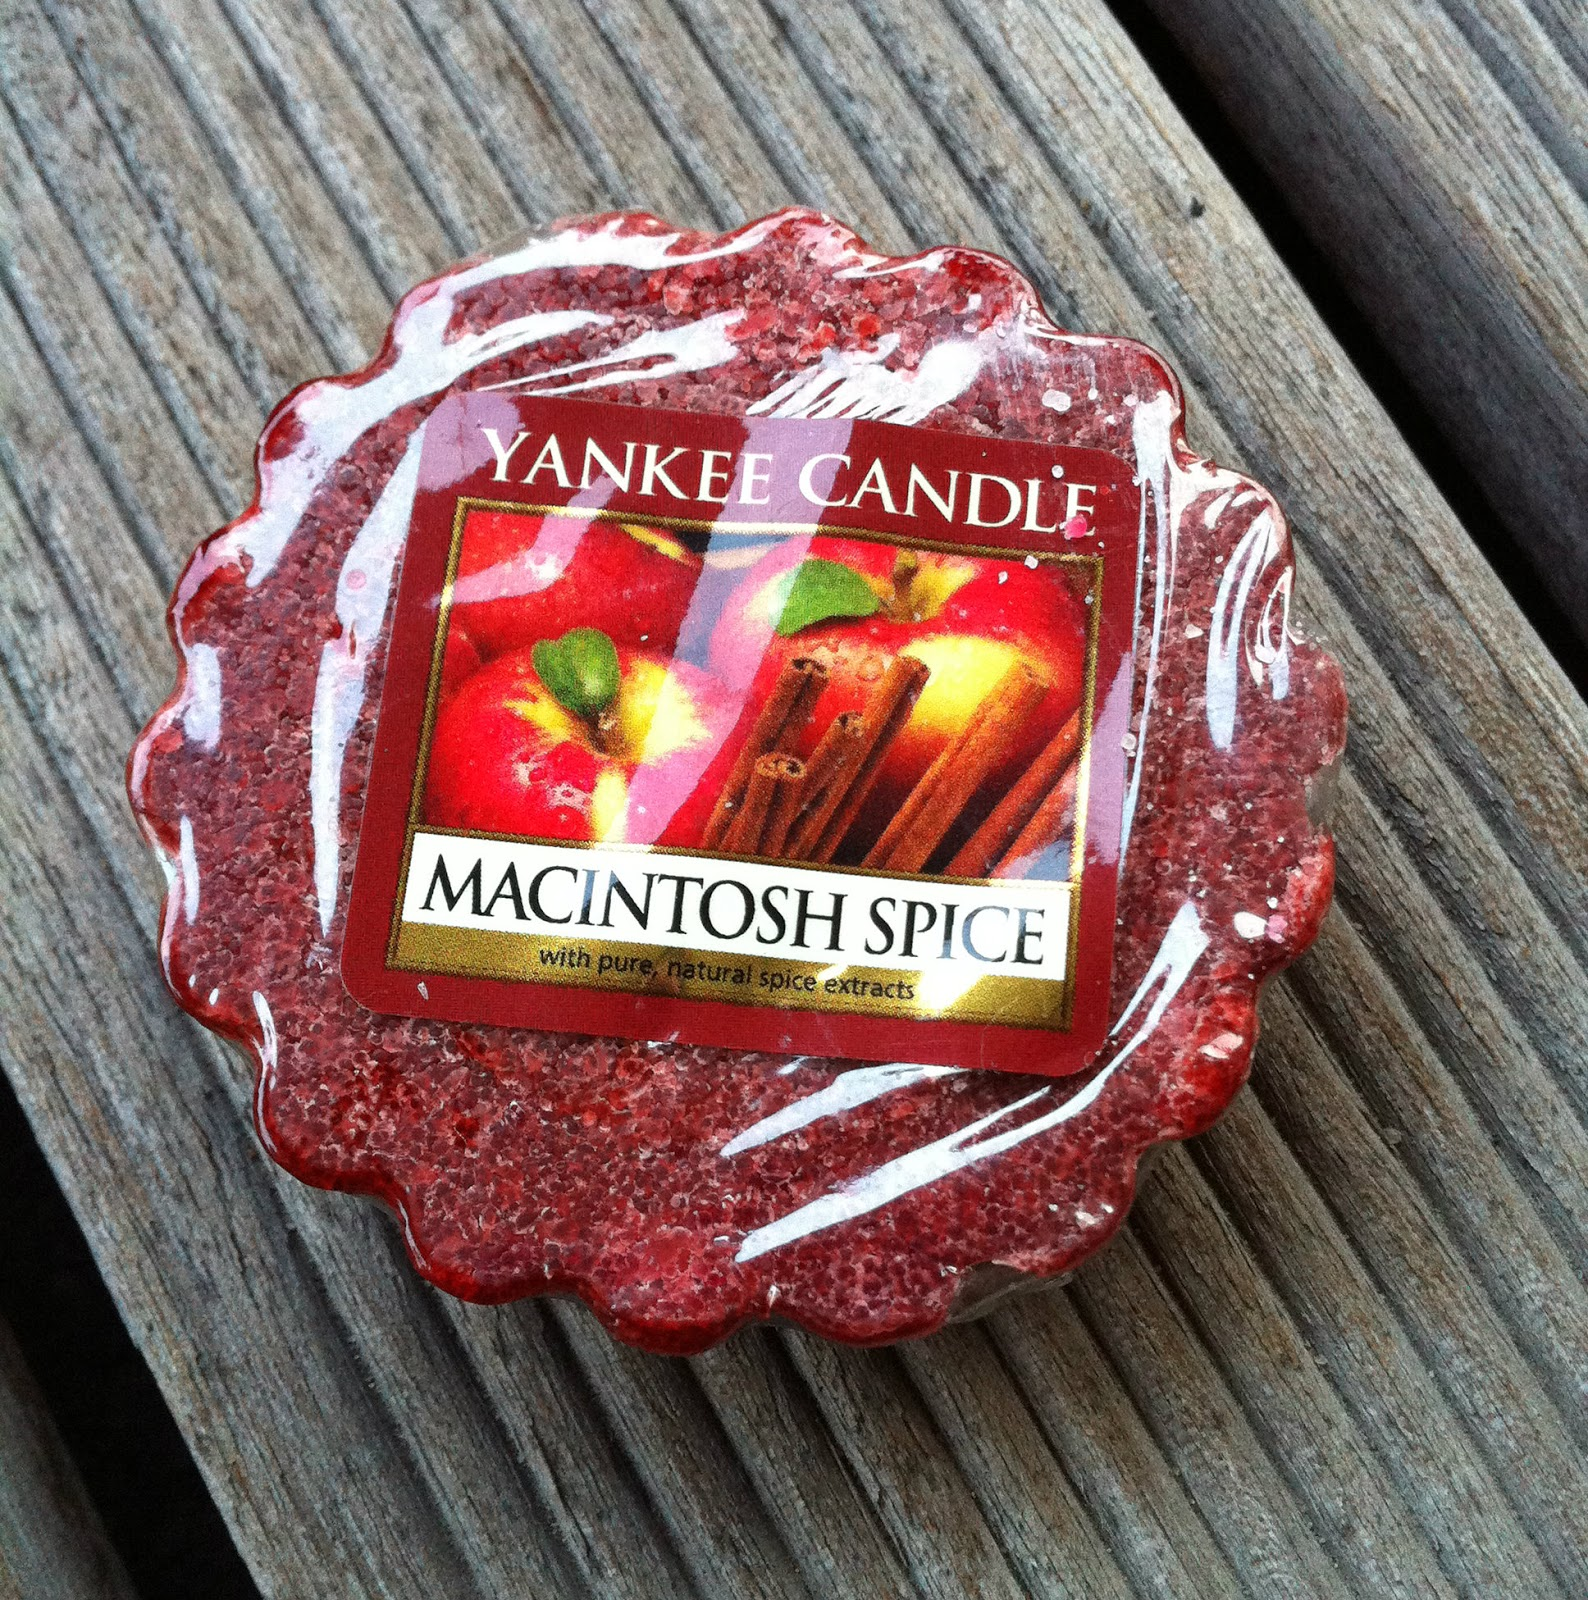 Macintosh Spice od Yankee Candle